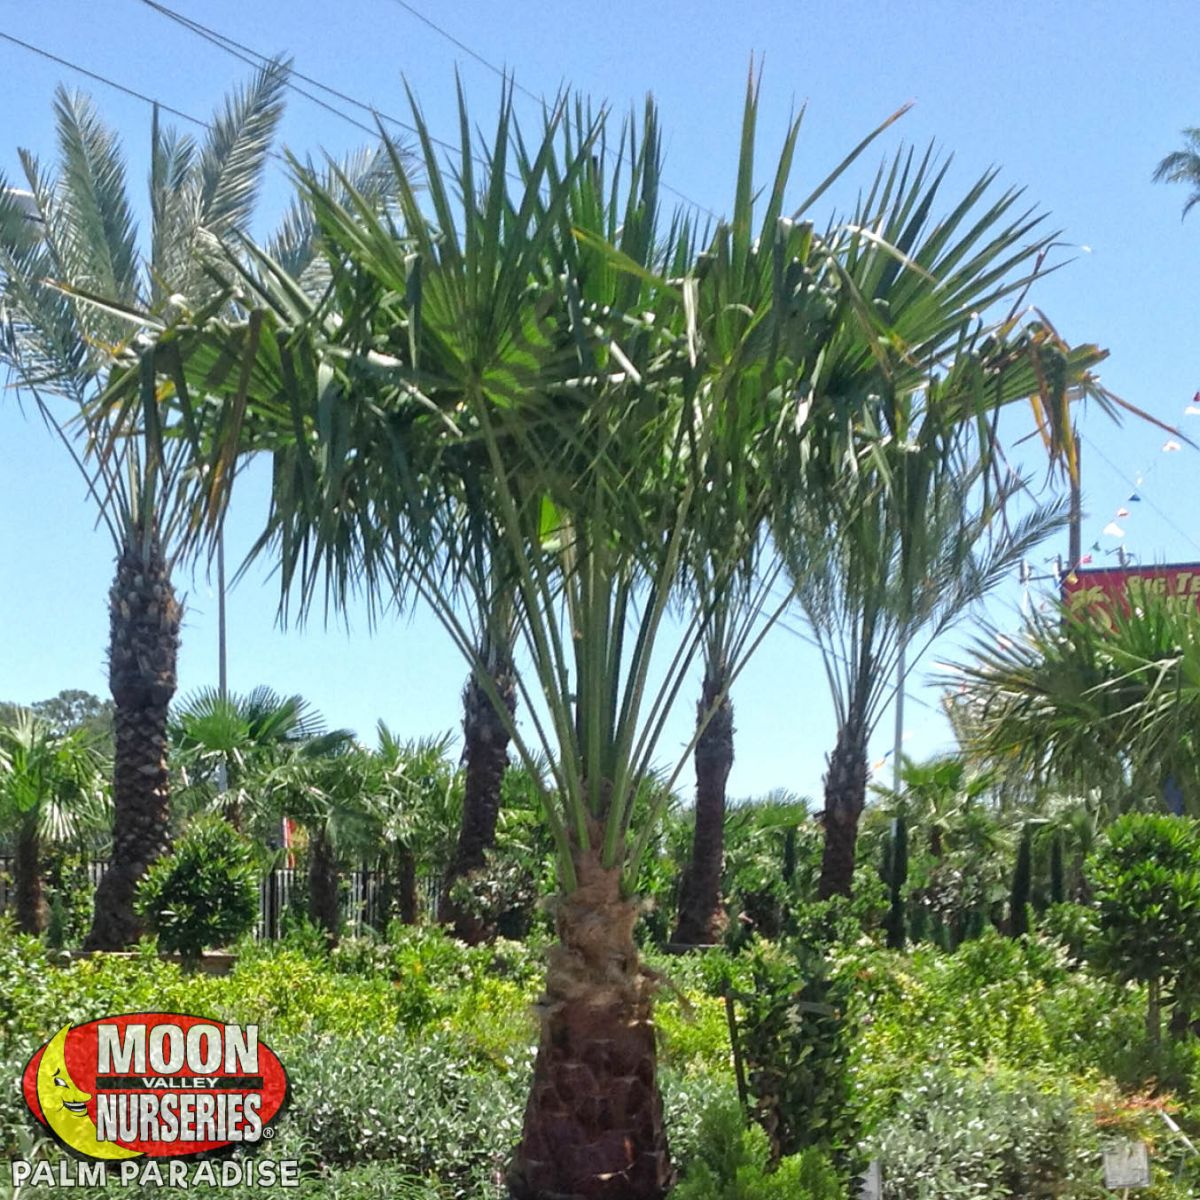 Ribbon Palm Palm Tree Palm Paradise Nursery